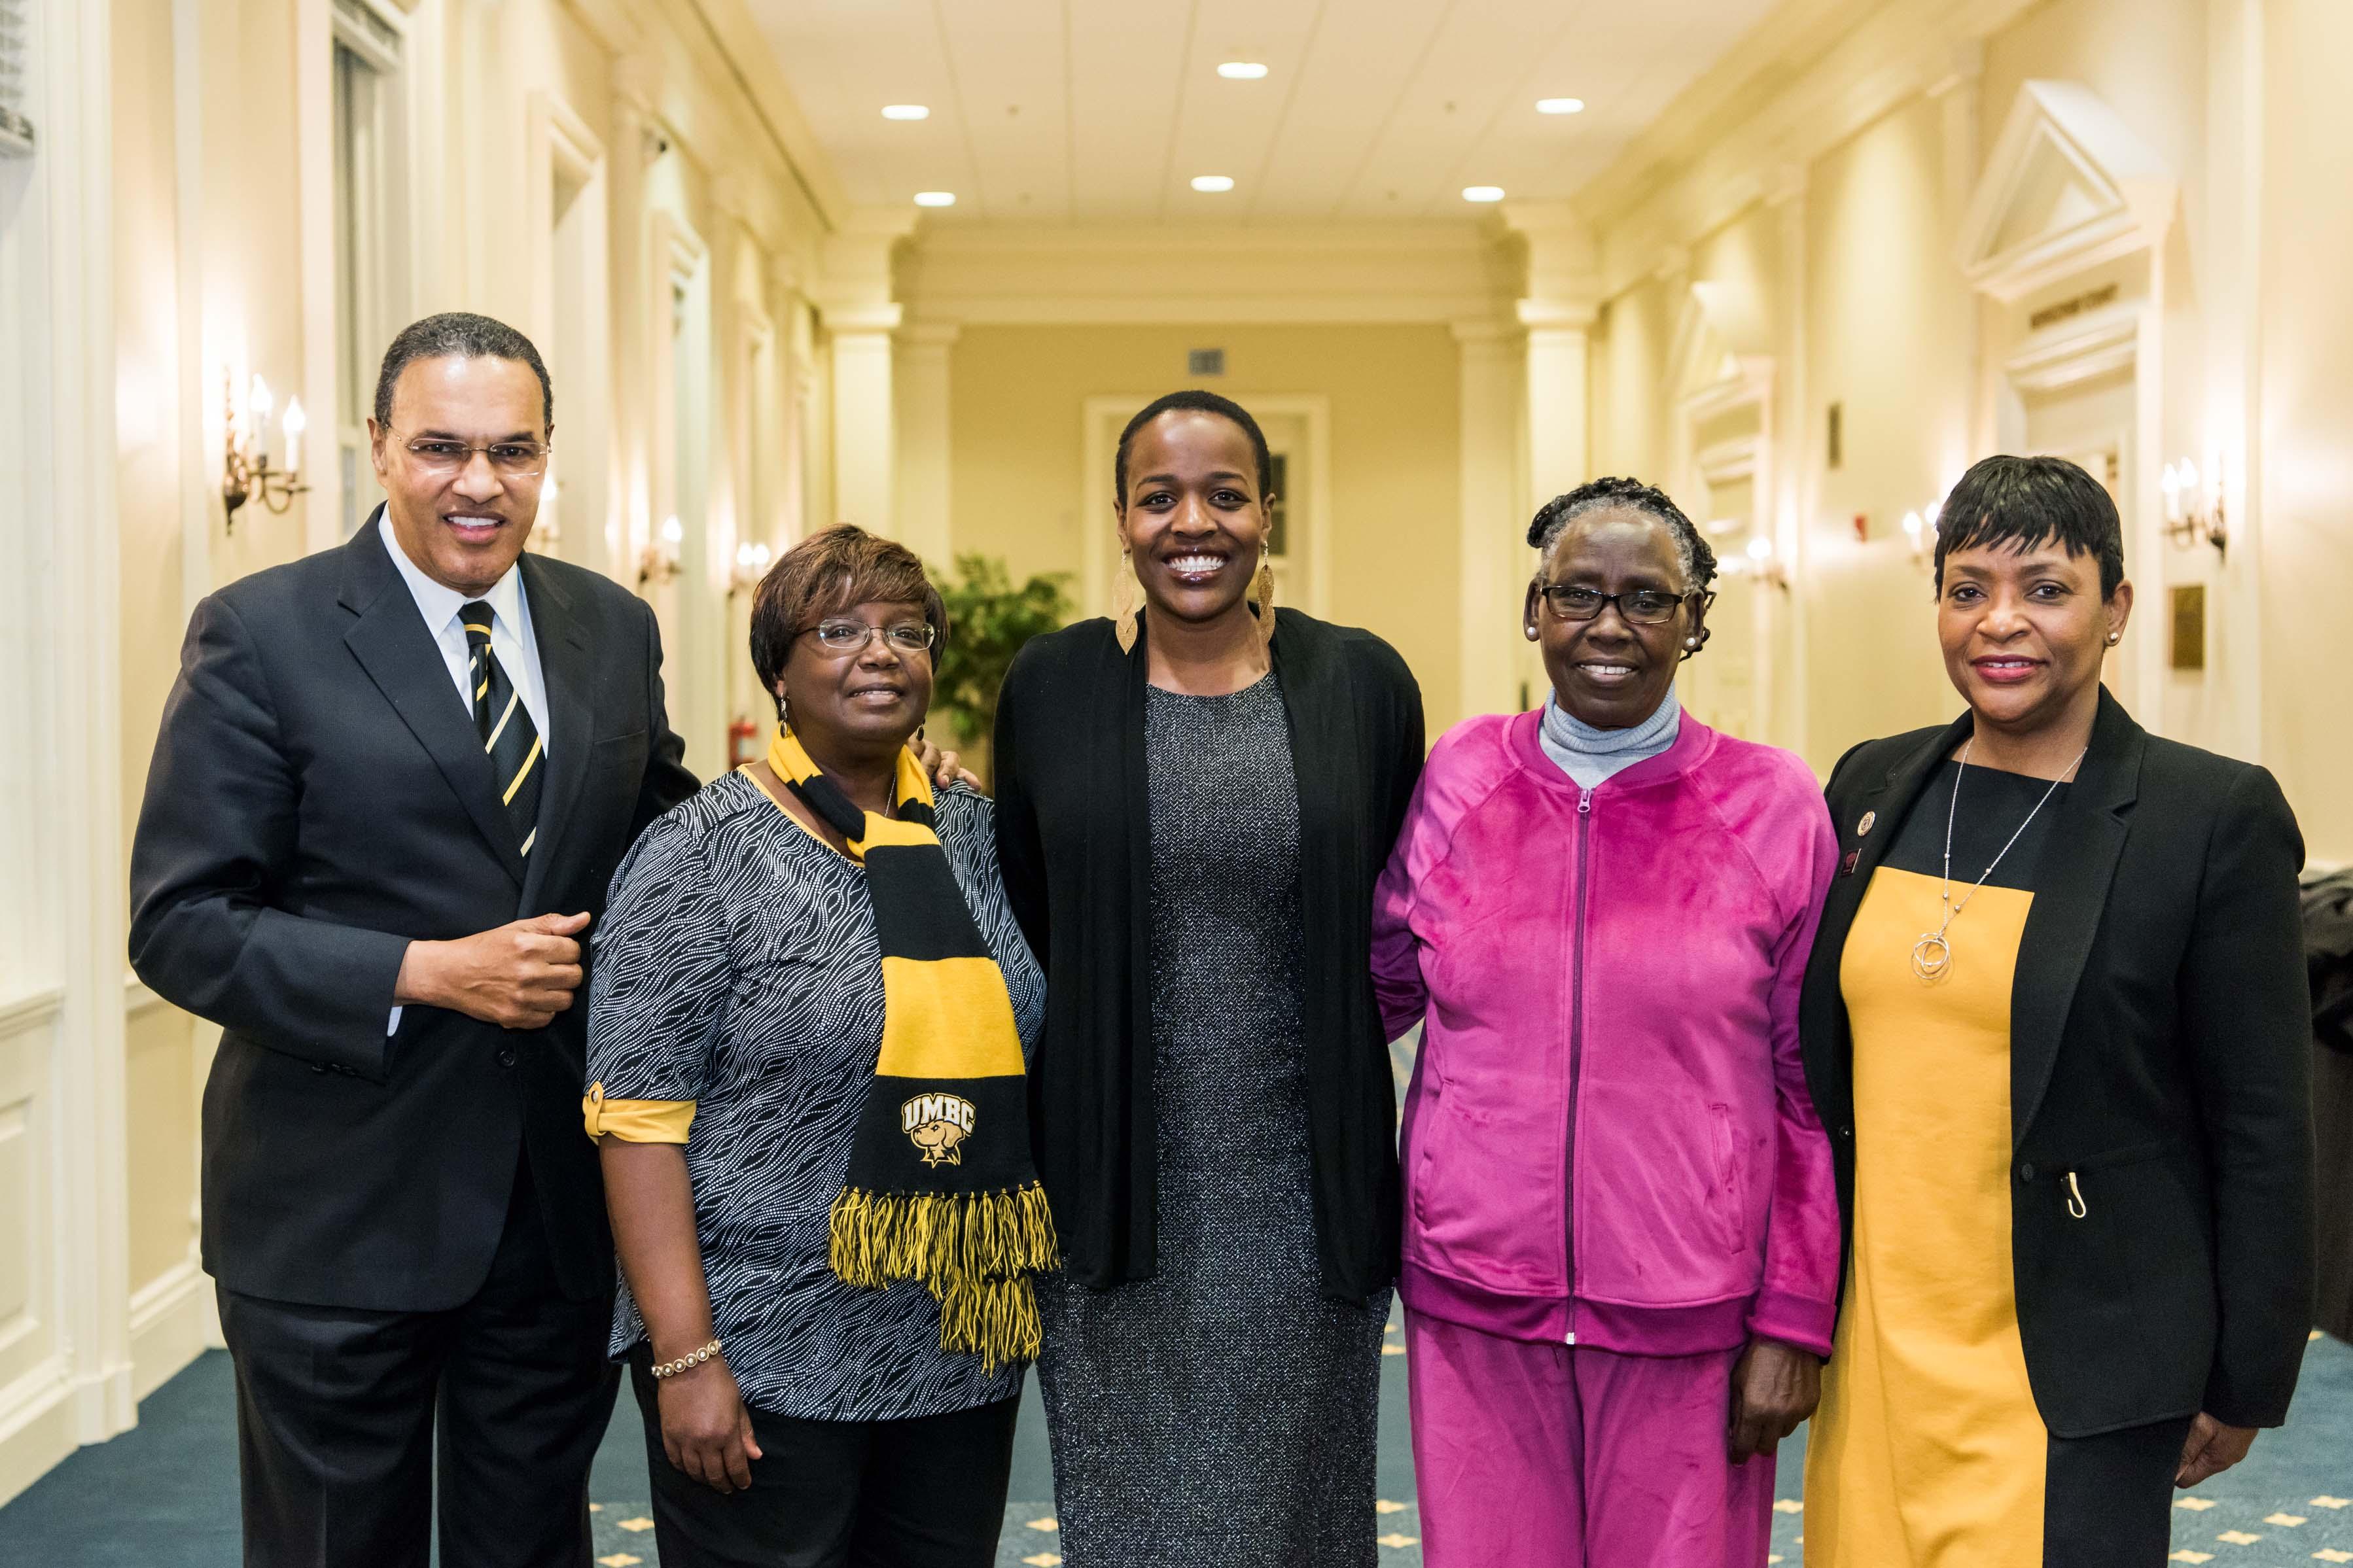 Naomi Mburu, Hrabowski, and others pose toegether at Annapolis Alumni reception